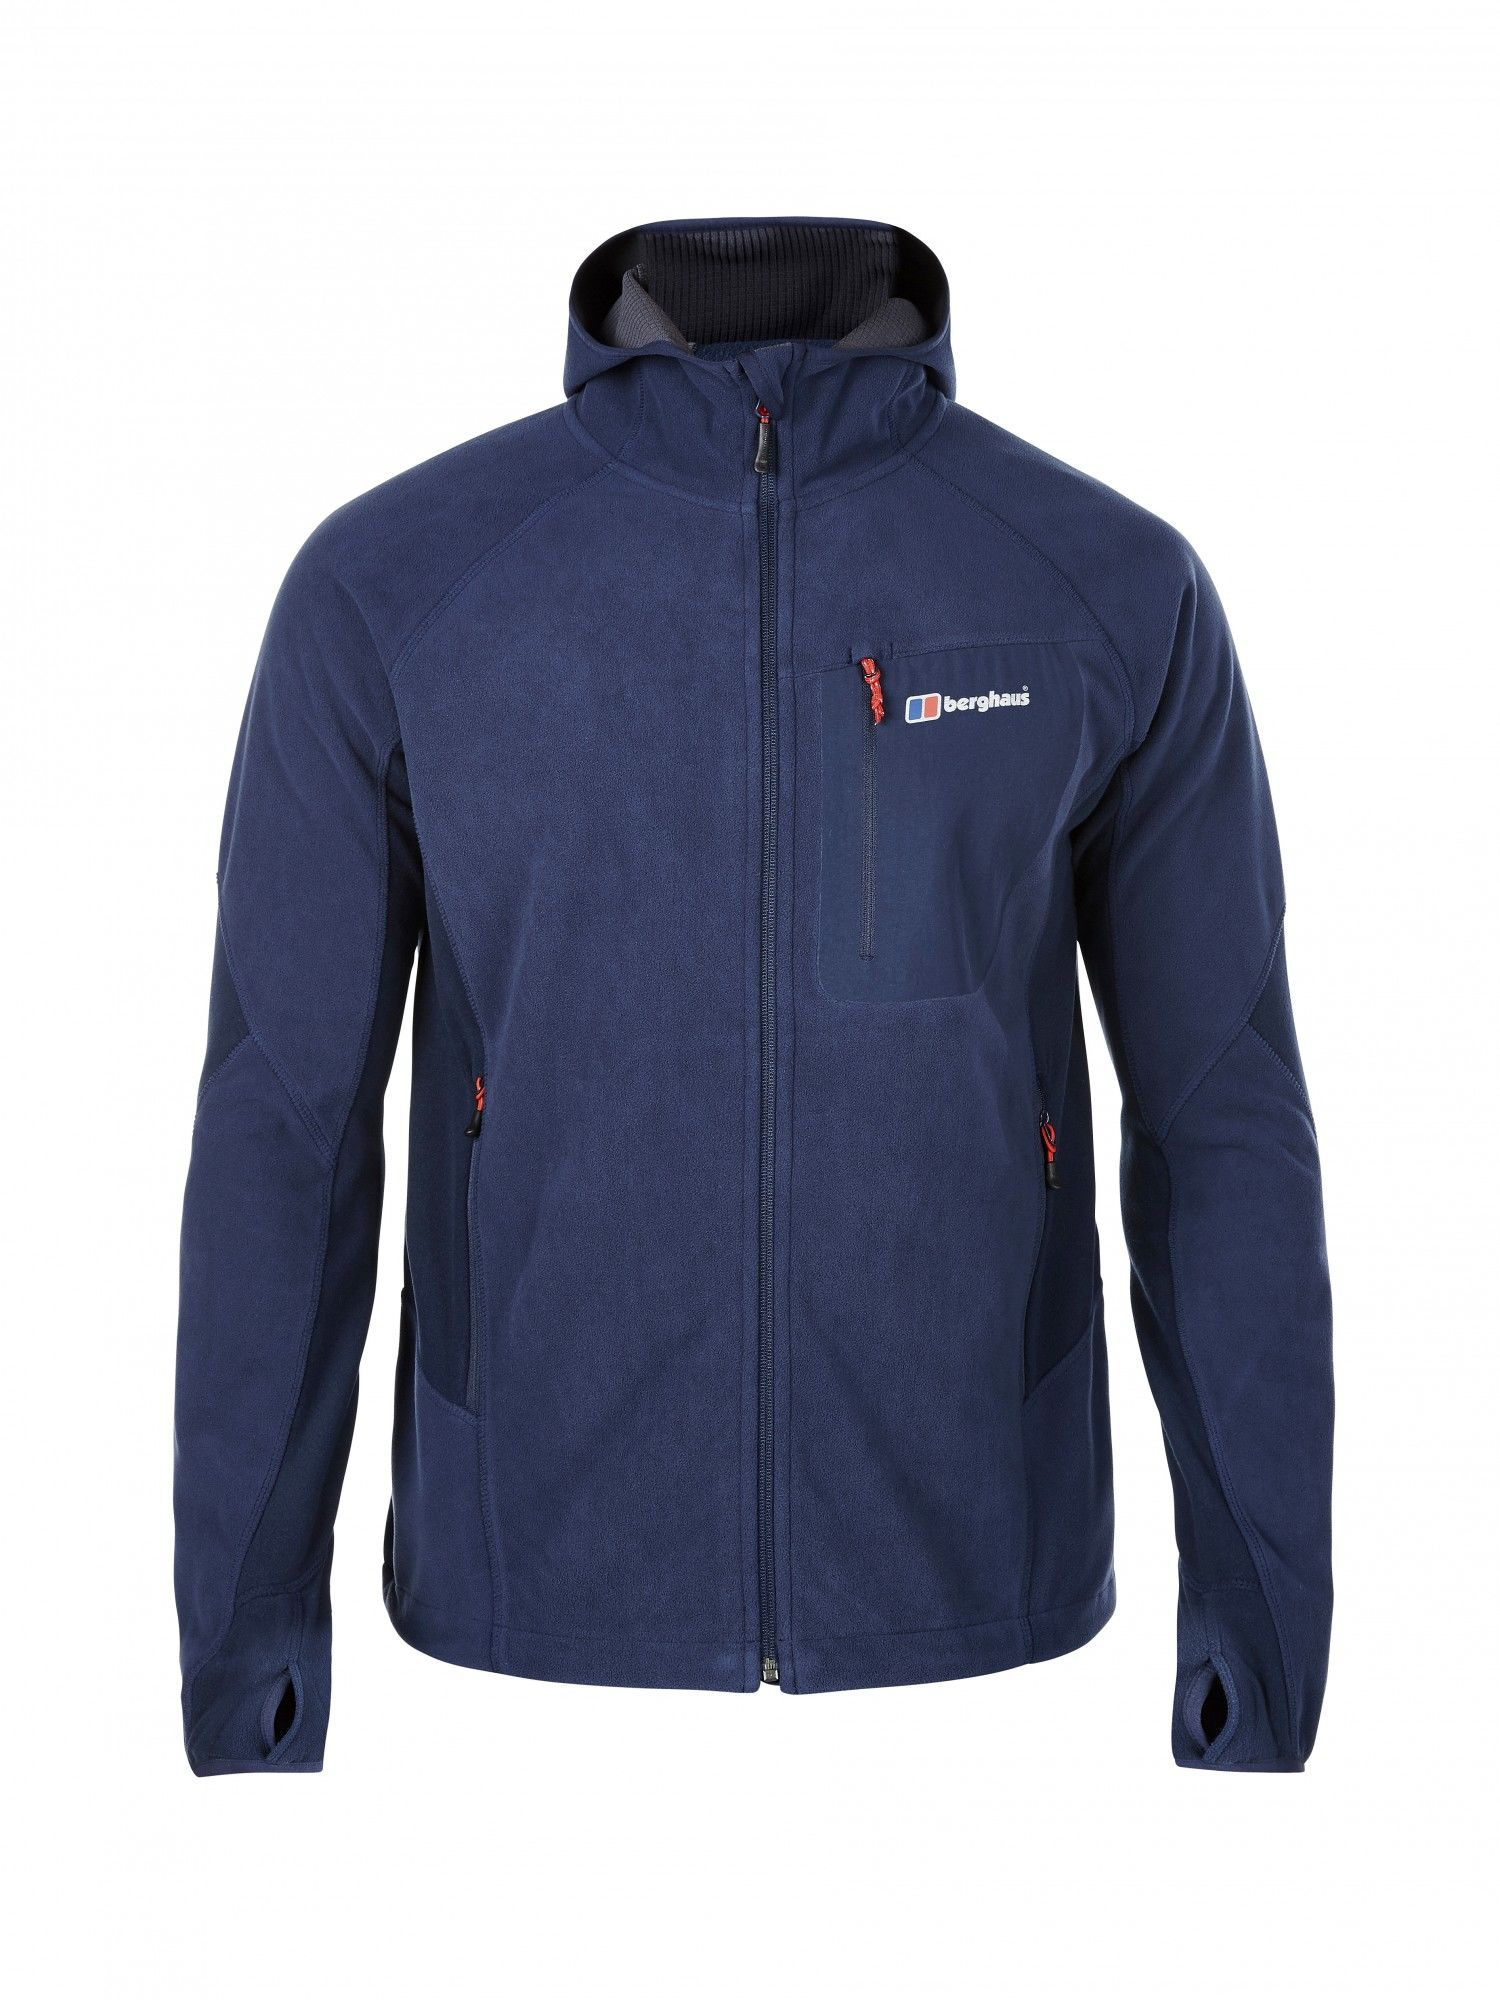 Berghaus BEN OShort-Sleeve Windproof Hooded Jacket Blau, Male Fleecejacke, S